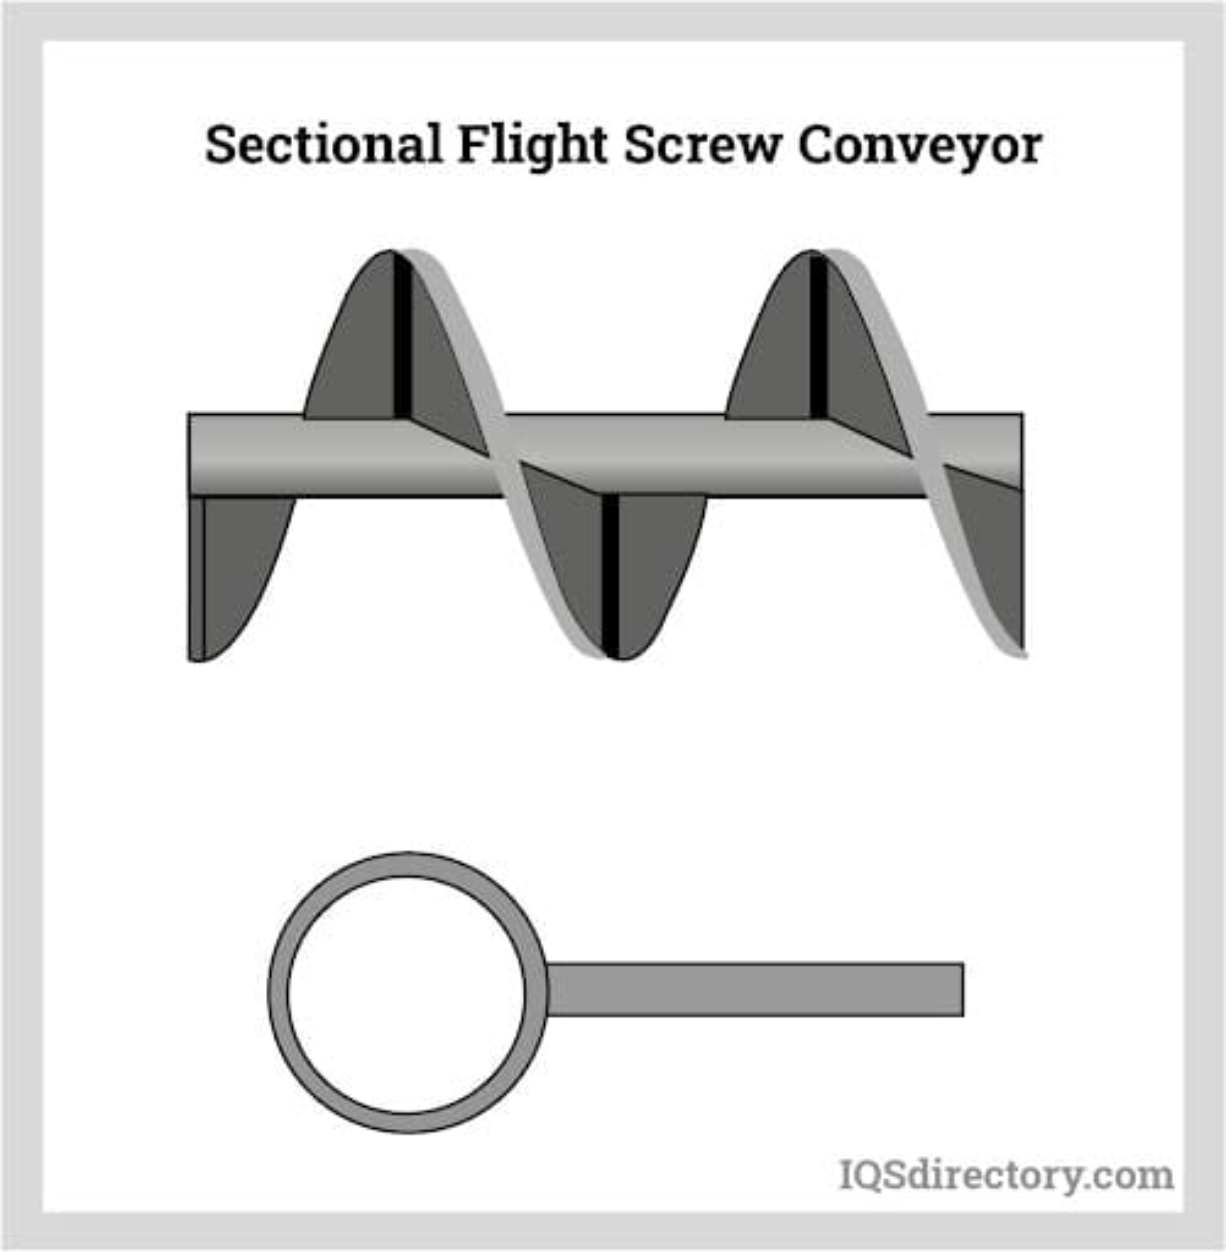 Sectional Flight Screw Conveyor